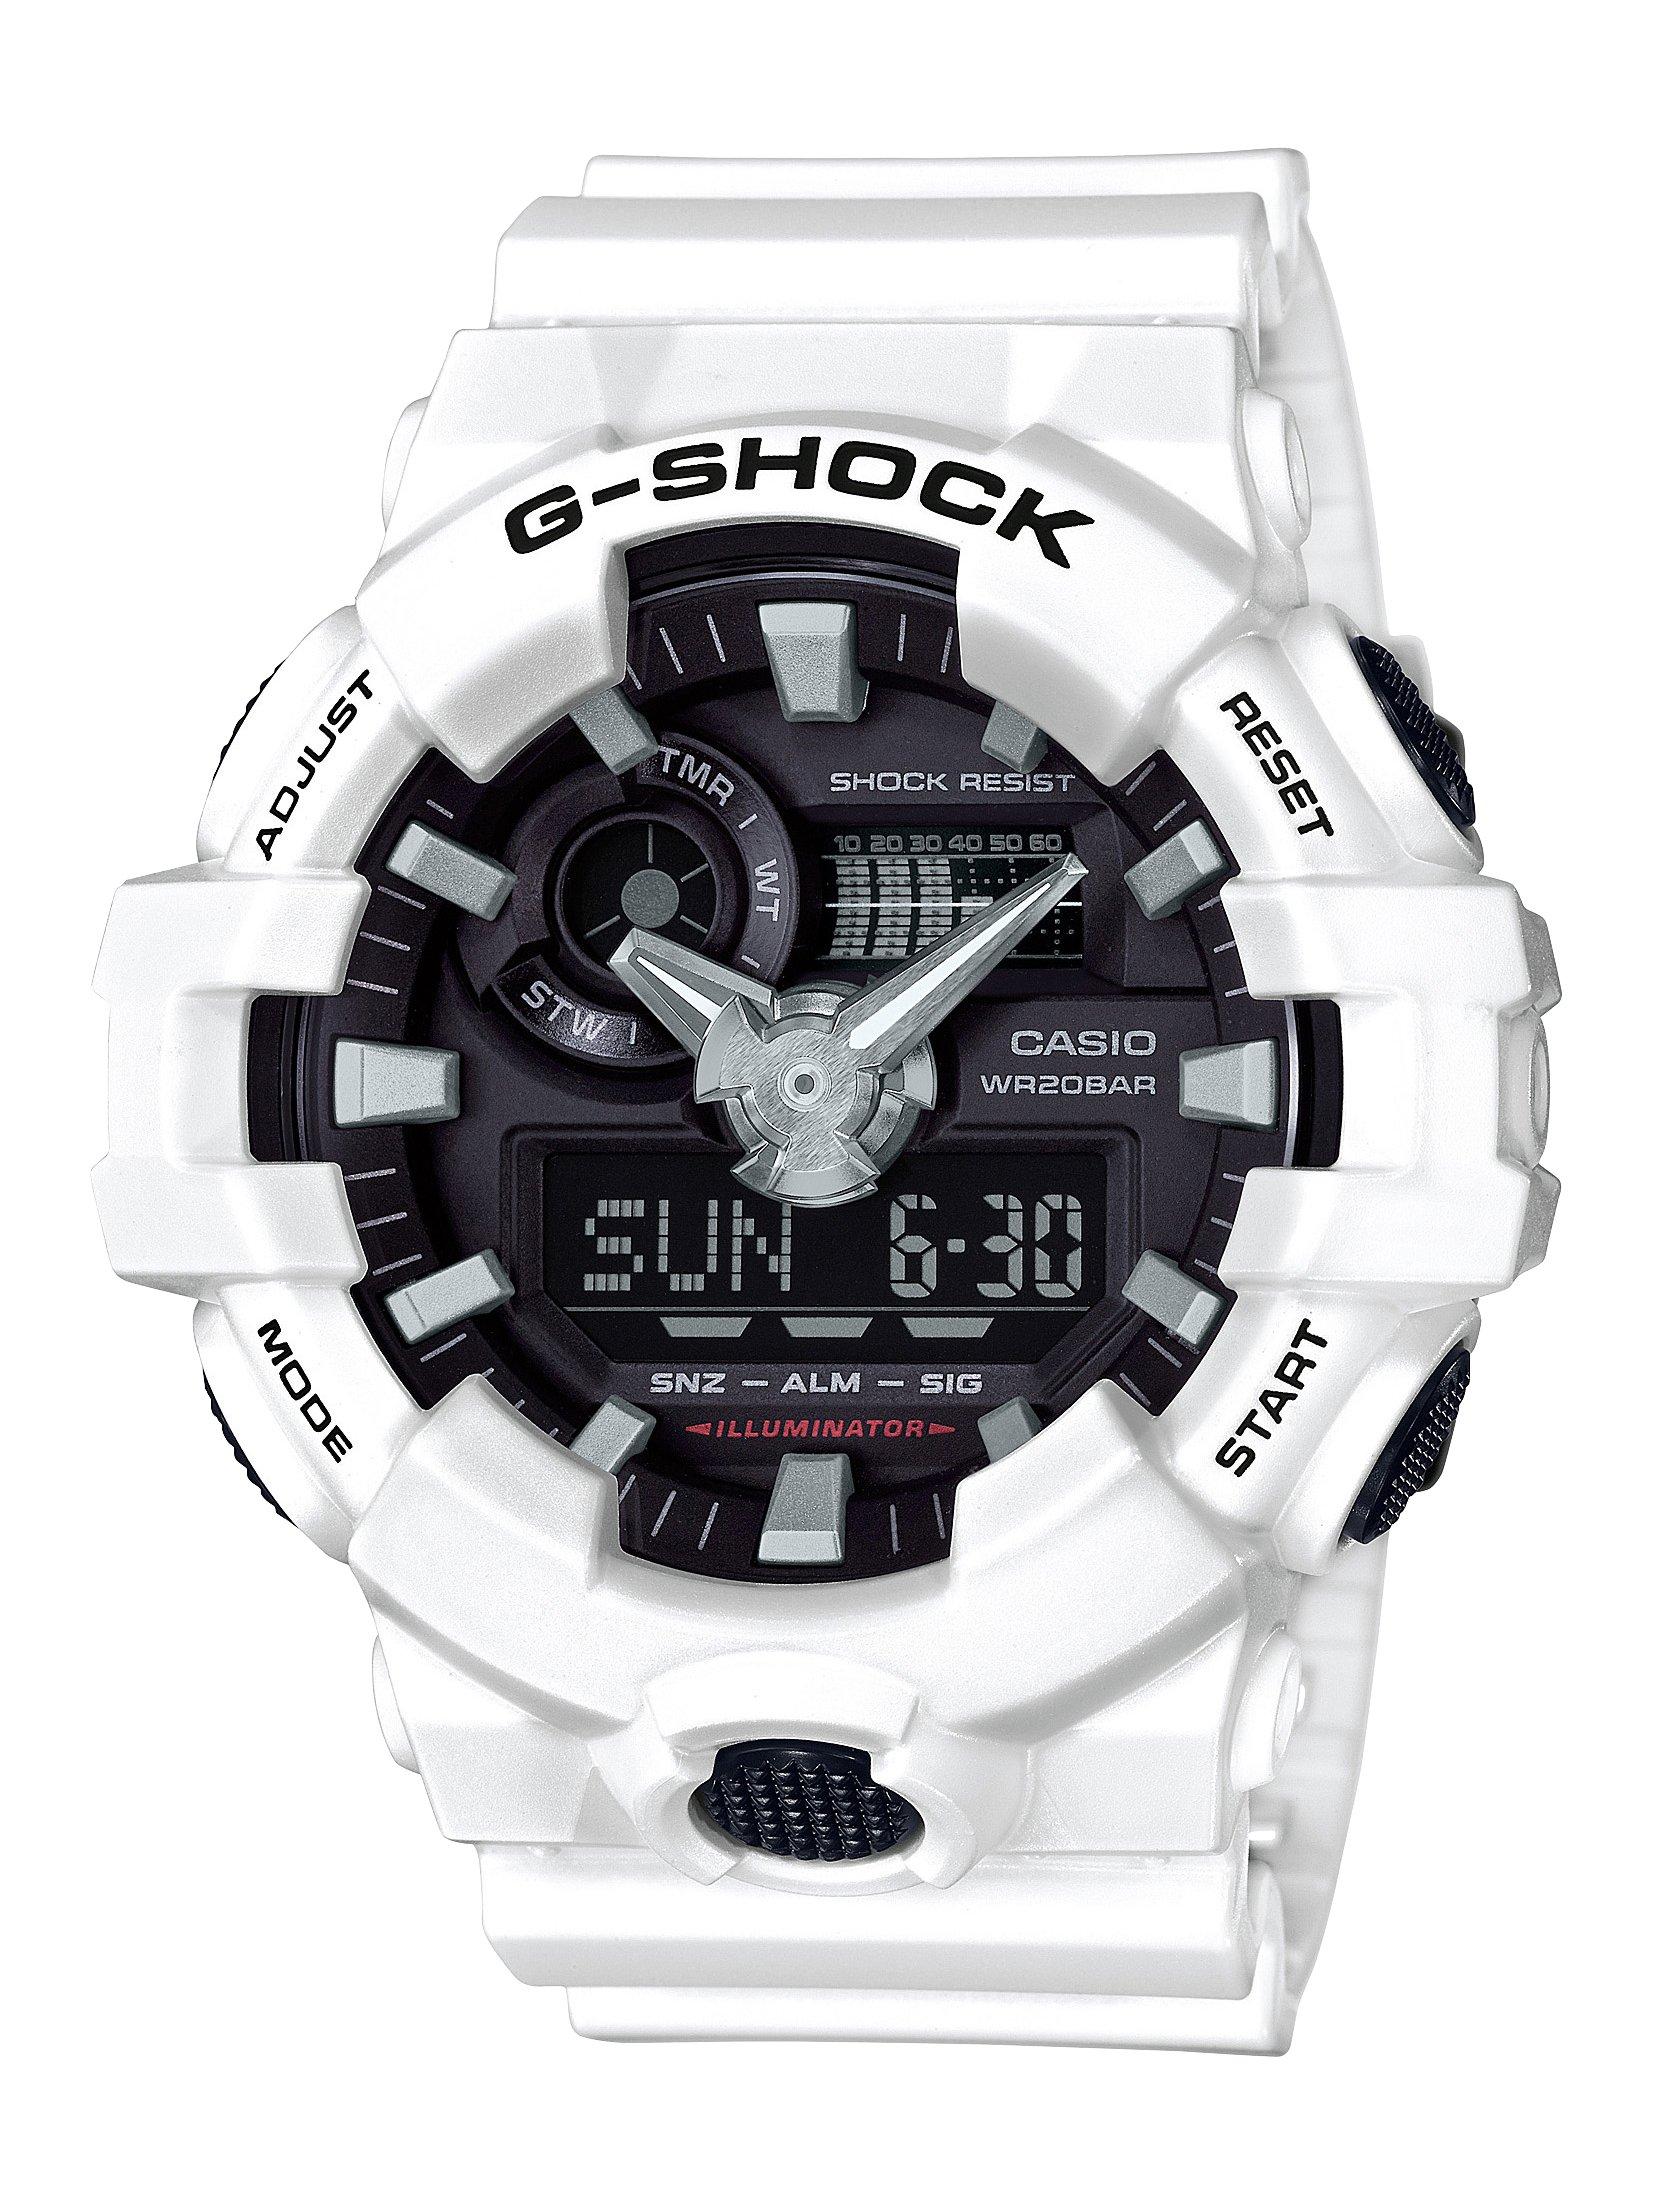 Casio Men's 'G SHOCK' Quartz Resin Casual Watch, Color White (Model: GA-700-7ACR) by Casio